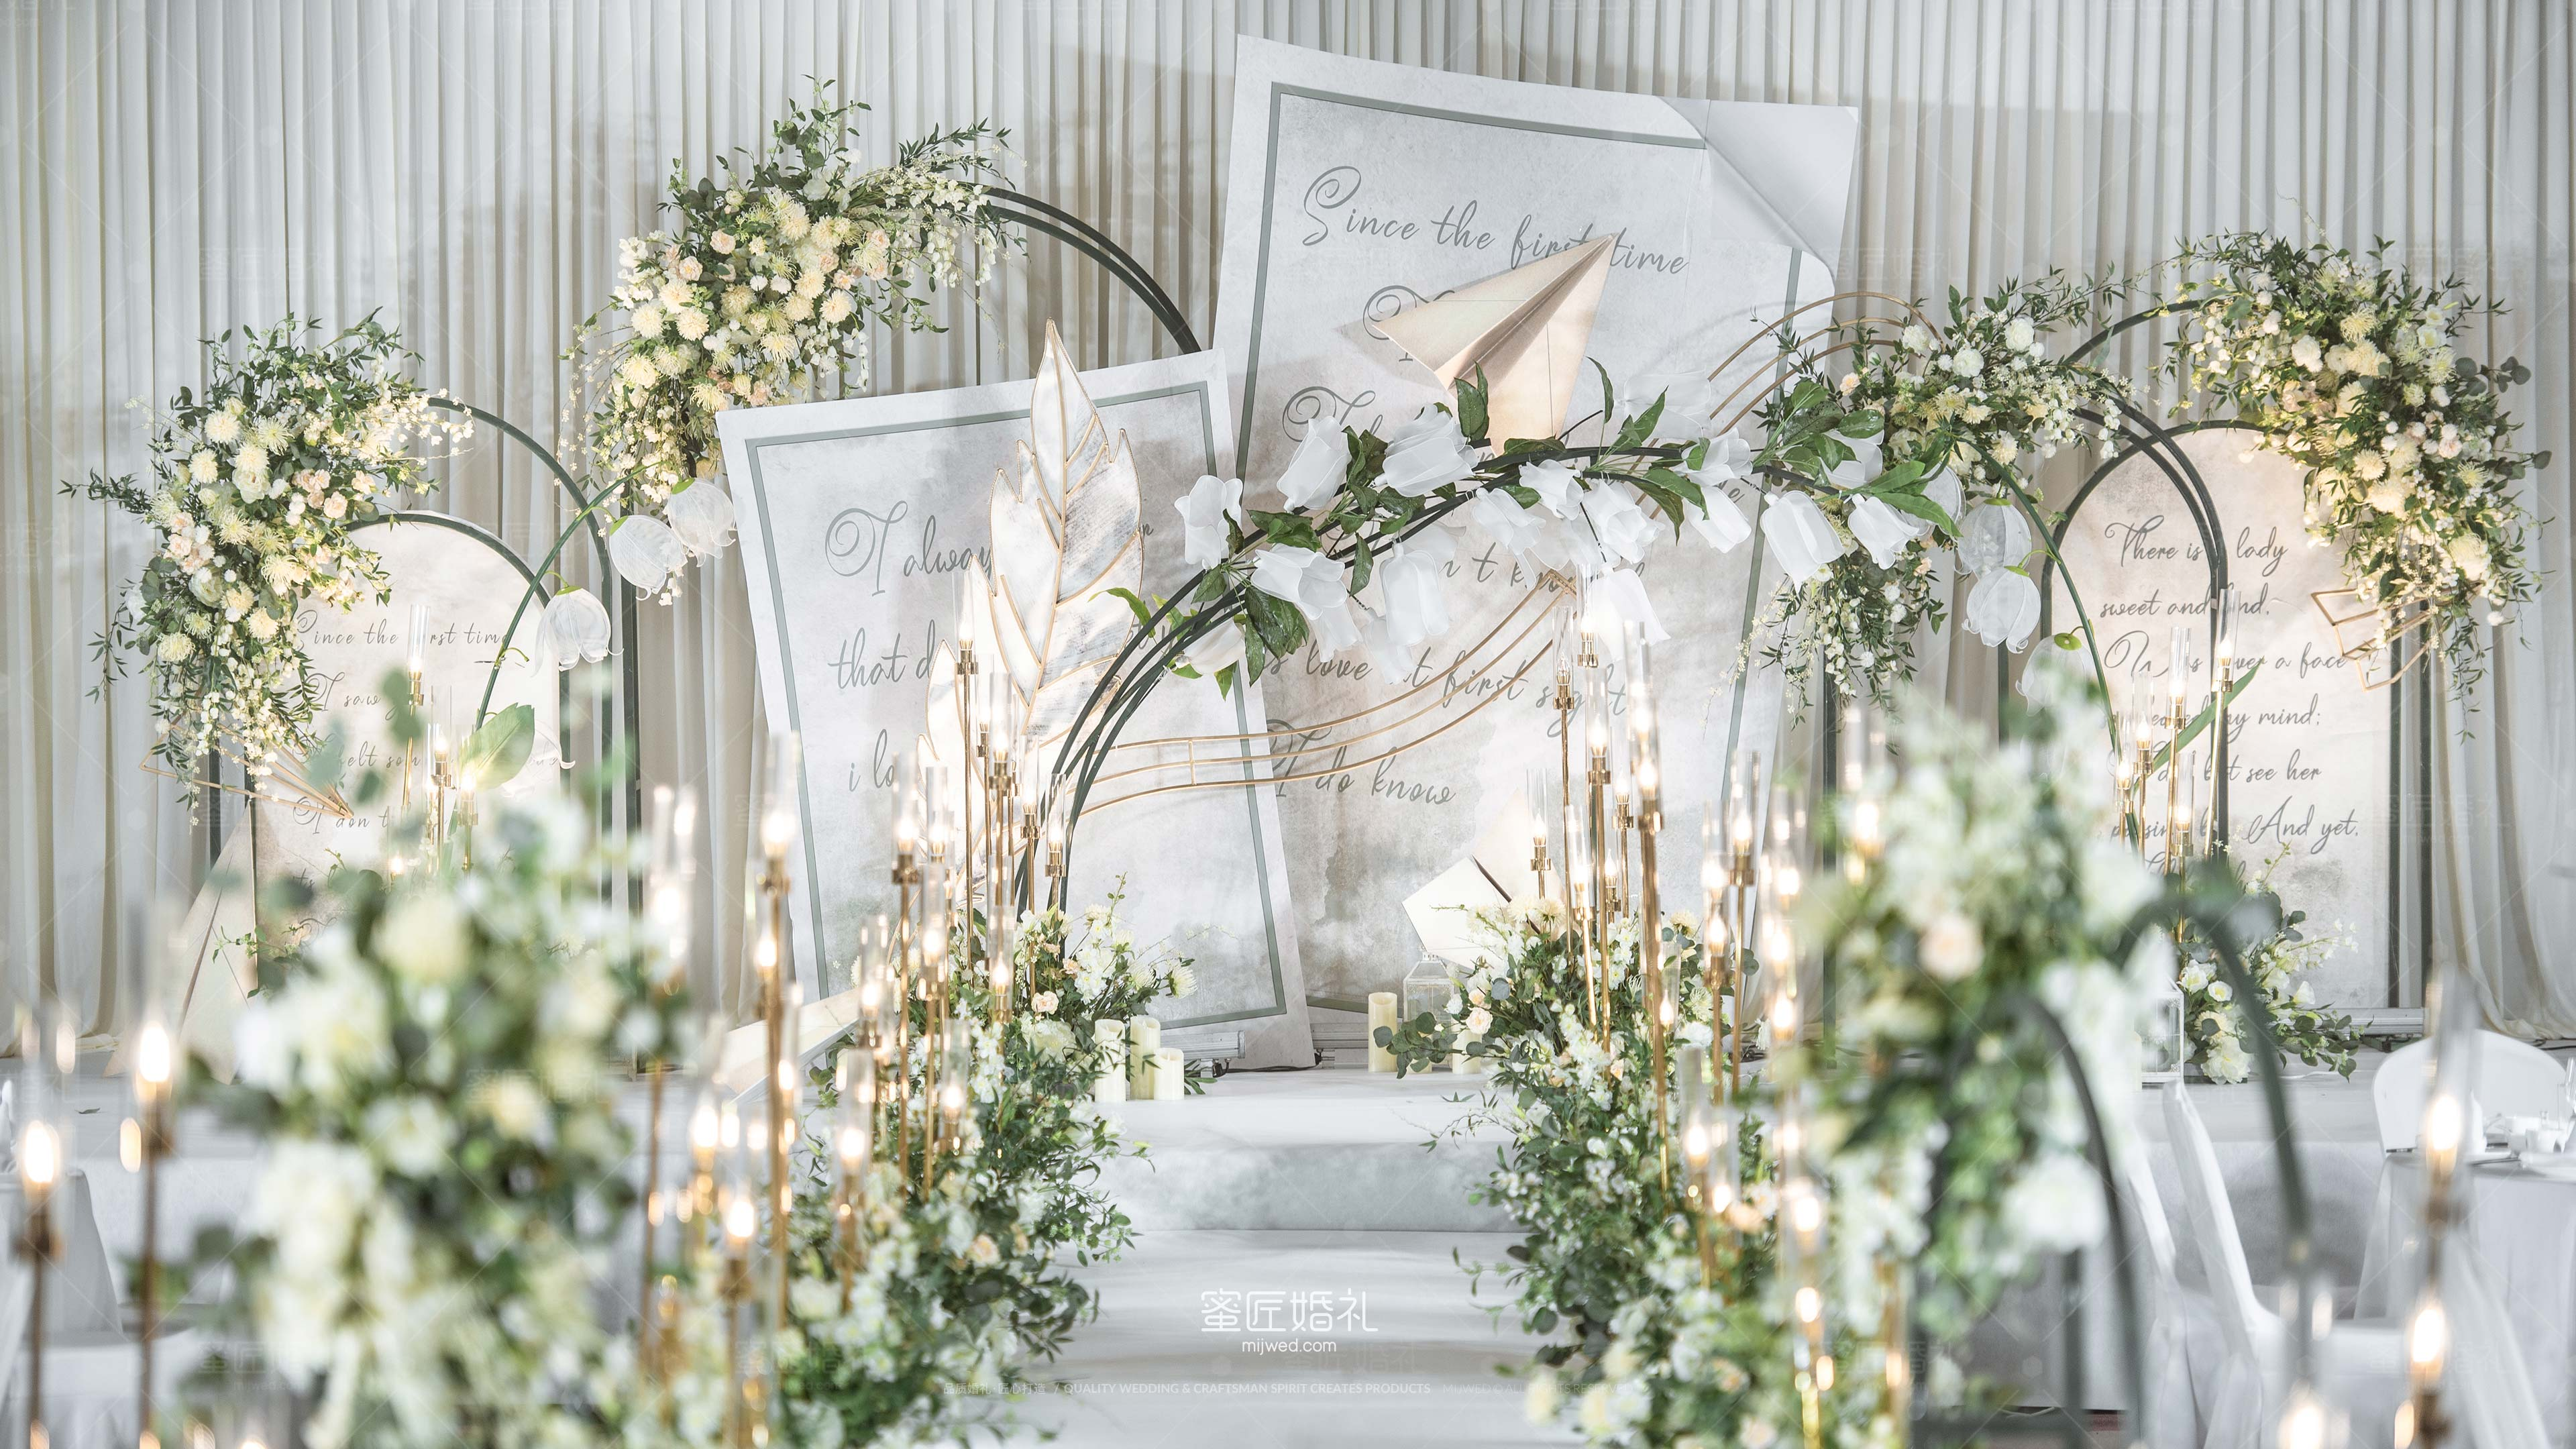 开封市婚礼策划方案:情书1